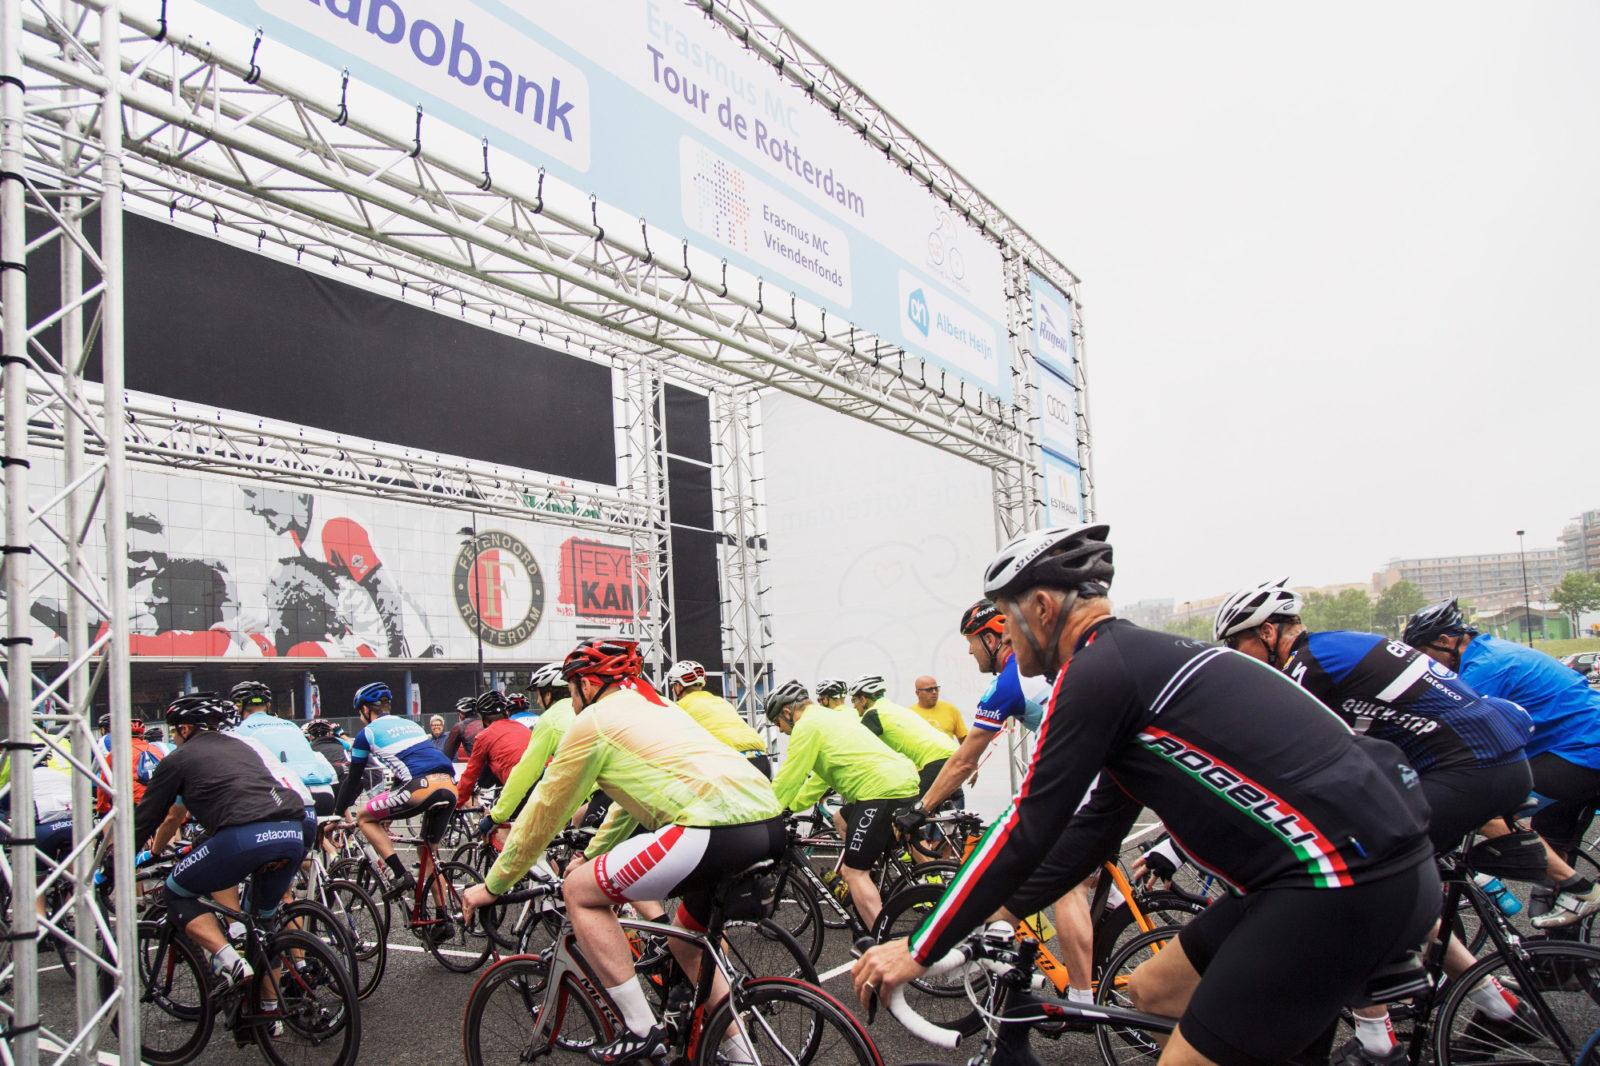 Erasmus MC Tour de Rotterdam, 24 juni 2017, start Topsportcentrum